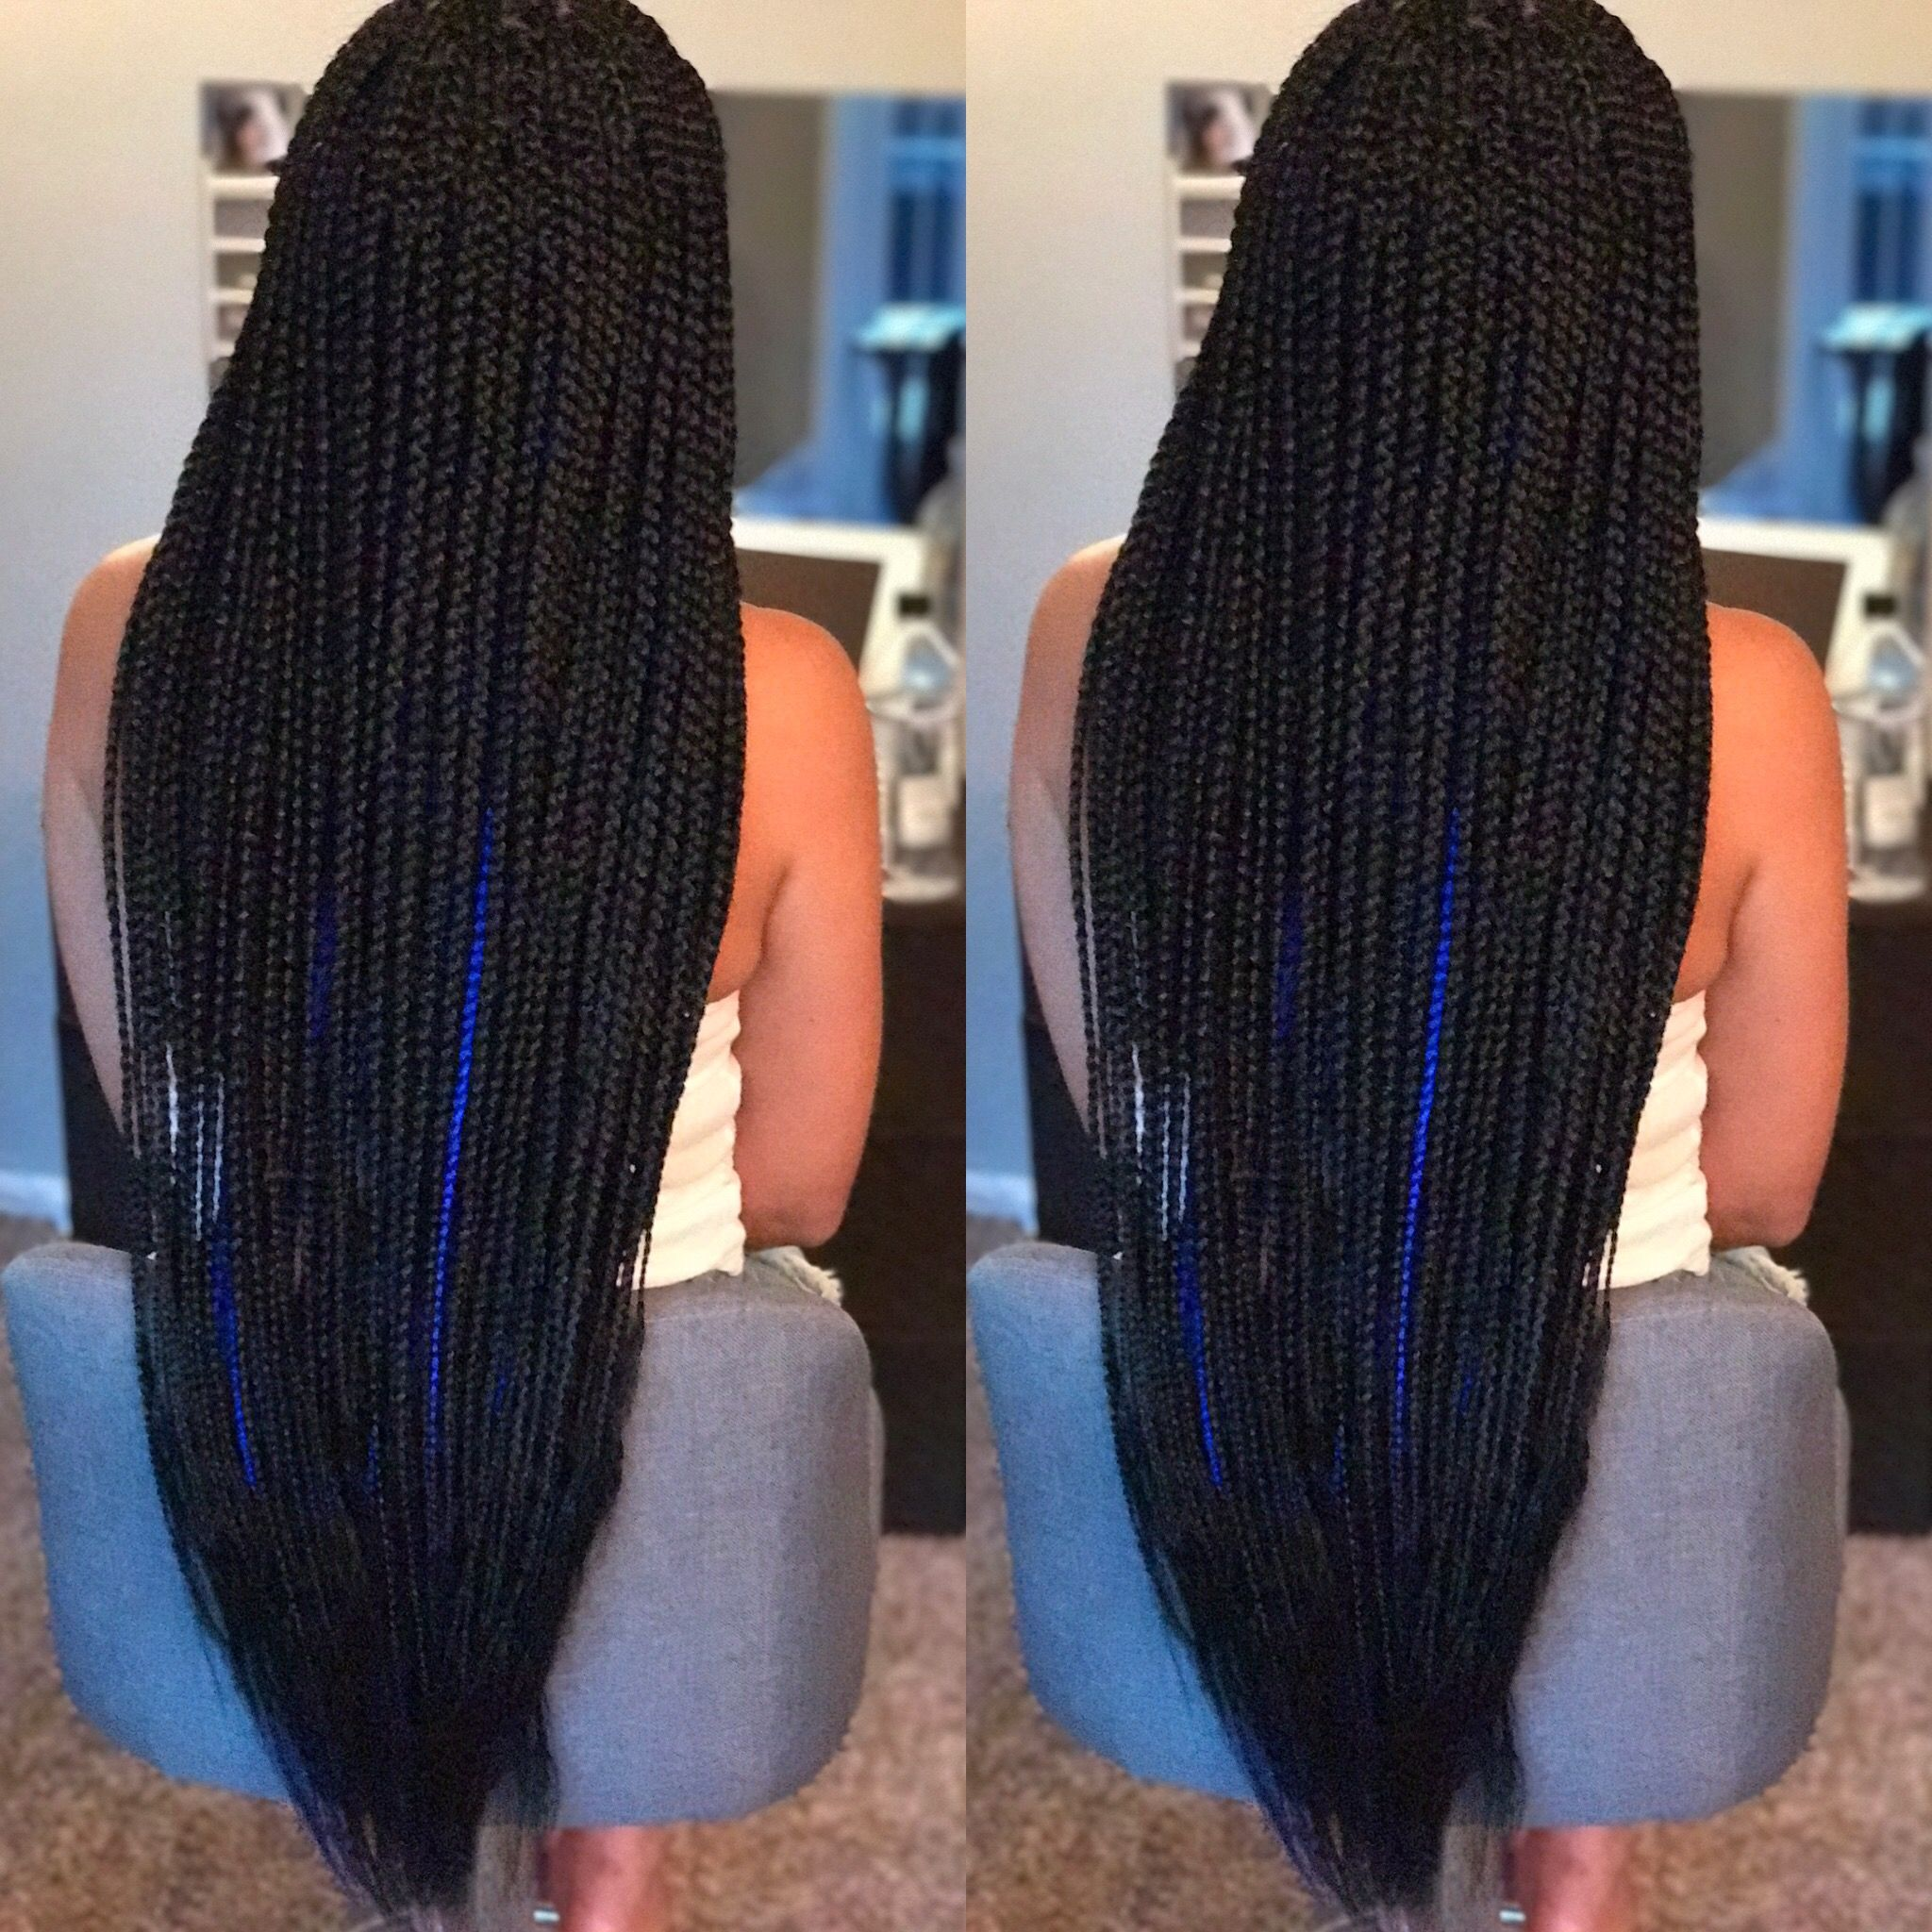 Phoenix Tempe Hairstylist Book Online Www Marmarzdivinestylez Com 520 371 3100 5151 E Guadalupe R Hair Styles Box Braids Hairstyles Braided Hairstyles